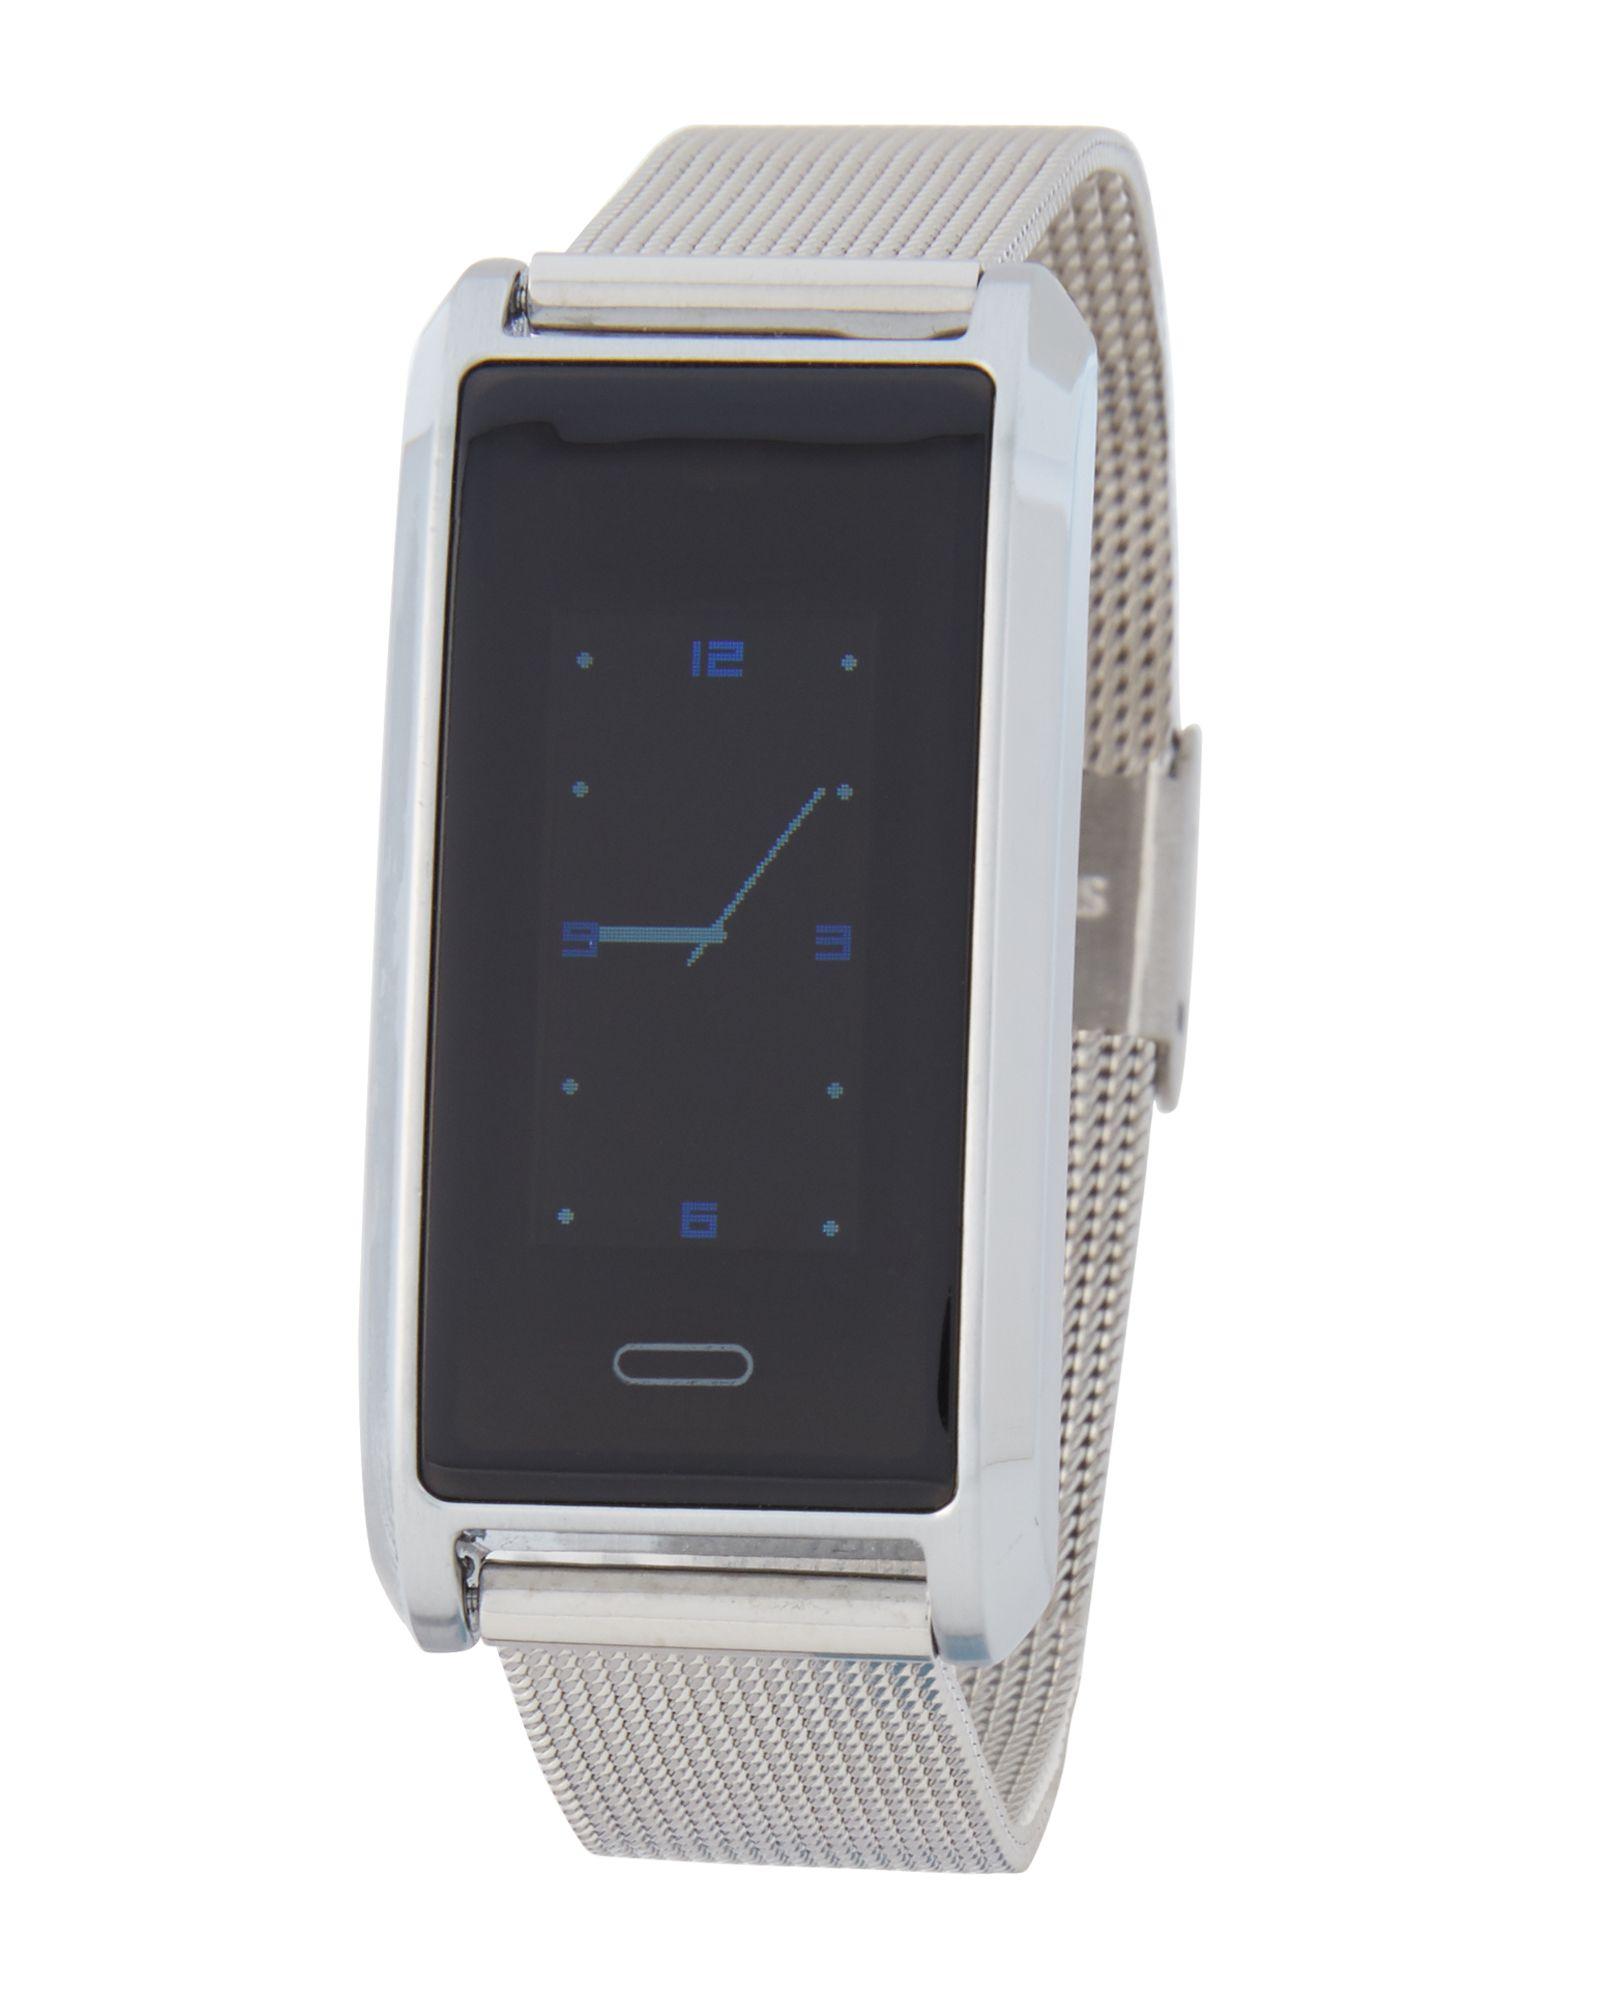 a1ff16862421 Beverly Hills Polo Club 81188 Silver-Tone Smart Watch   Strap Set ...